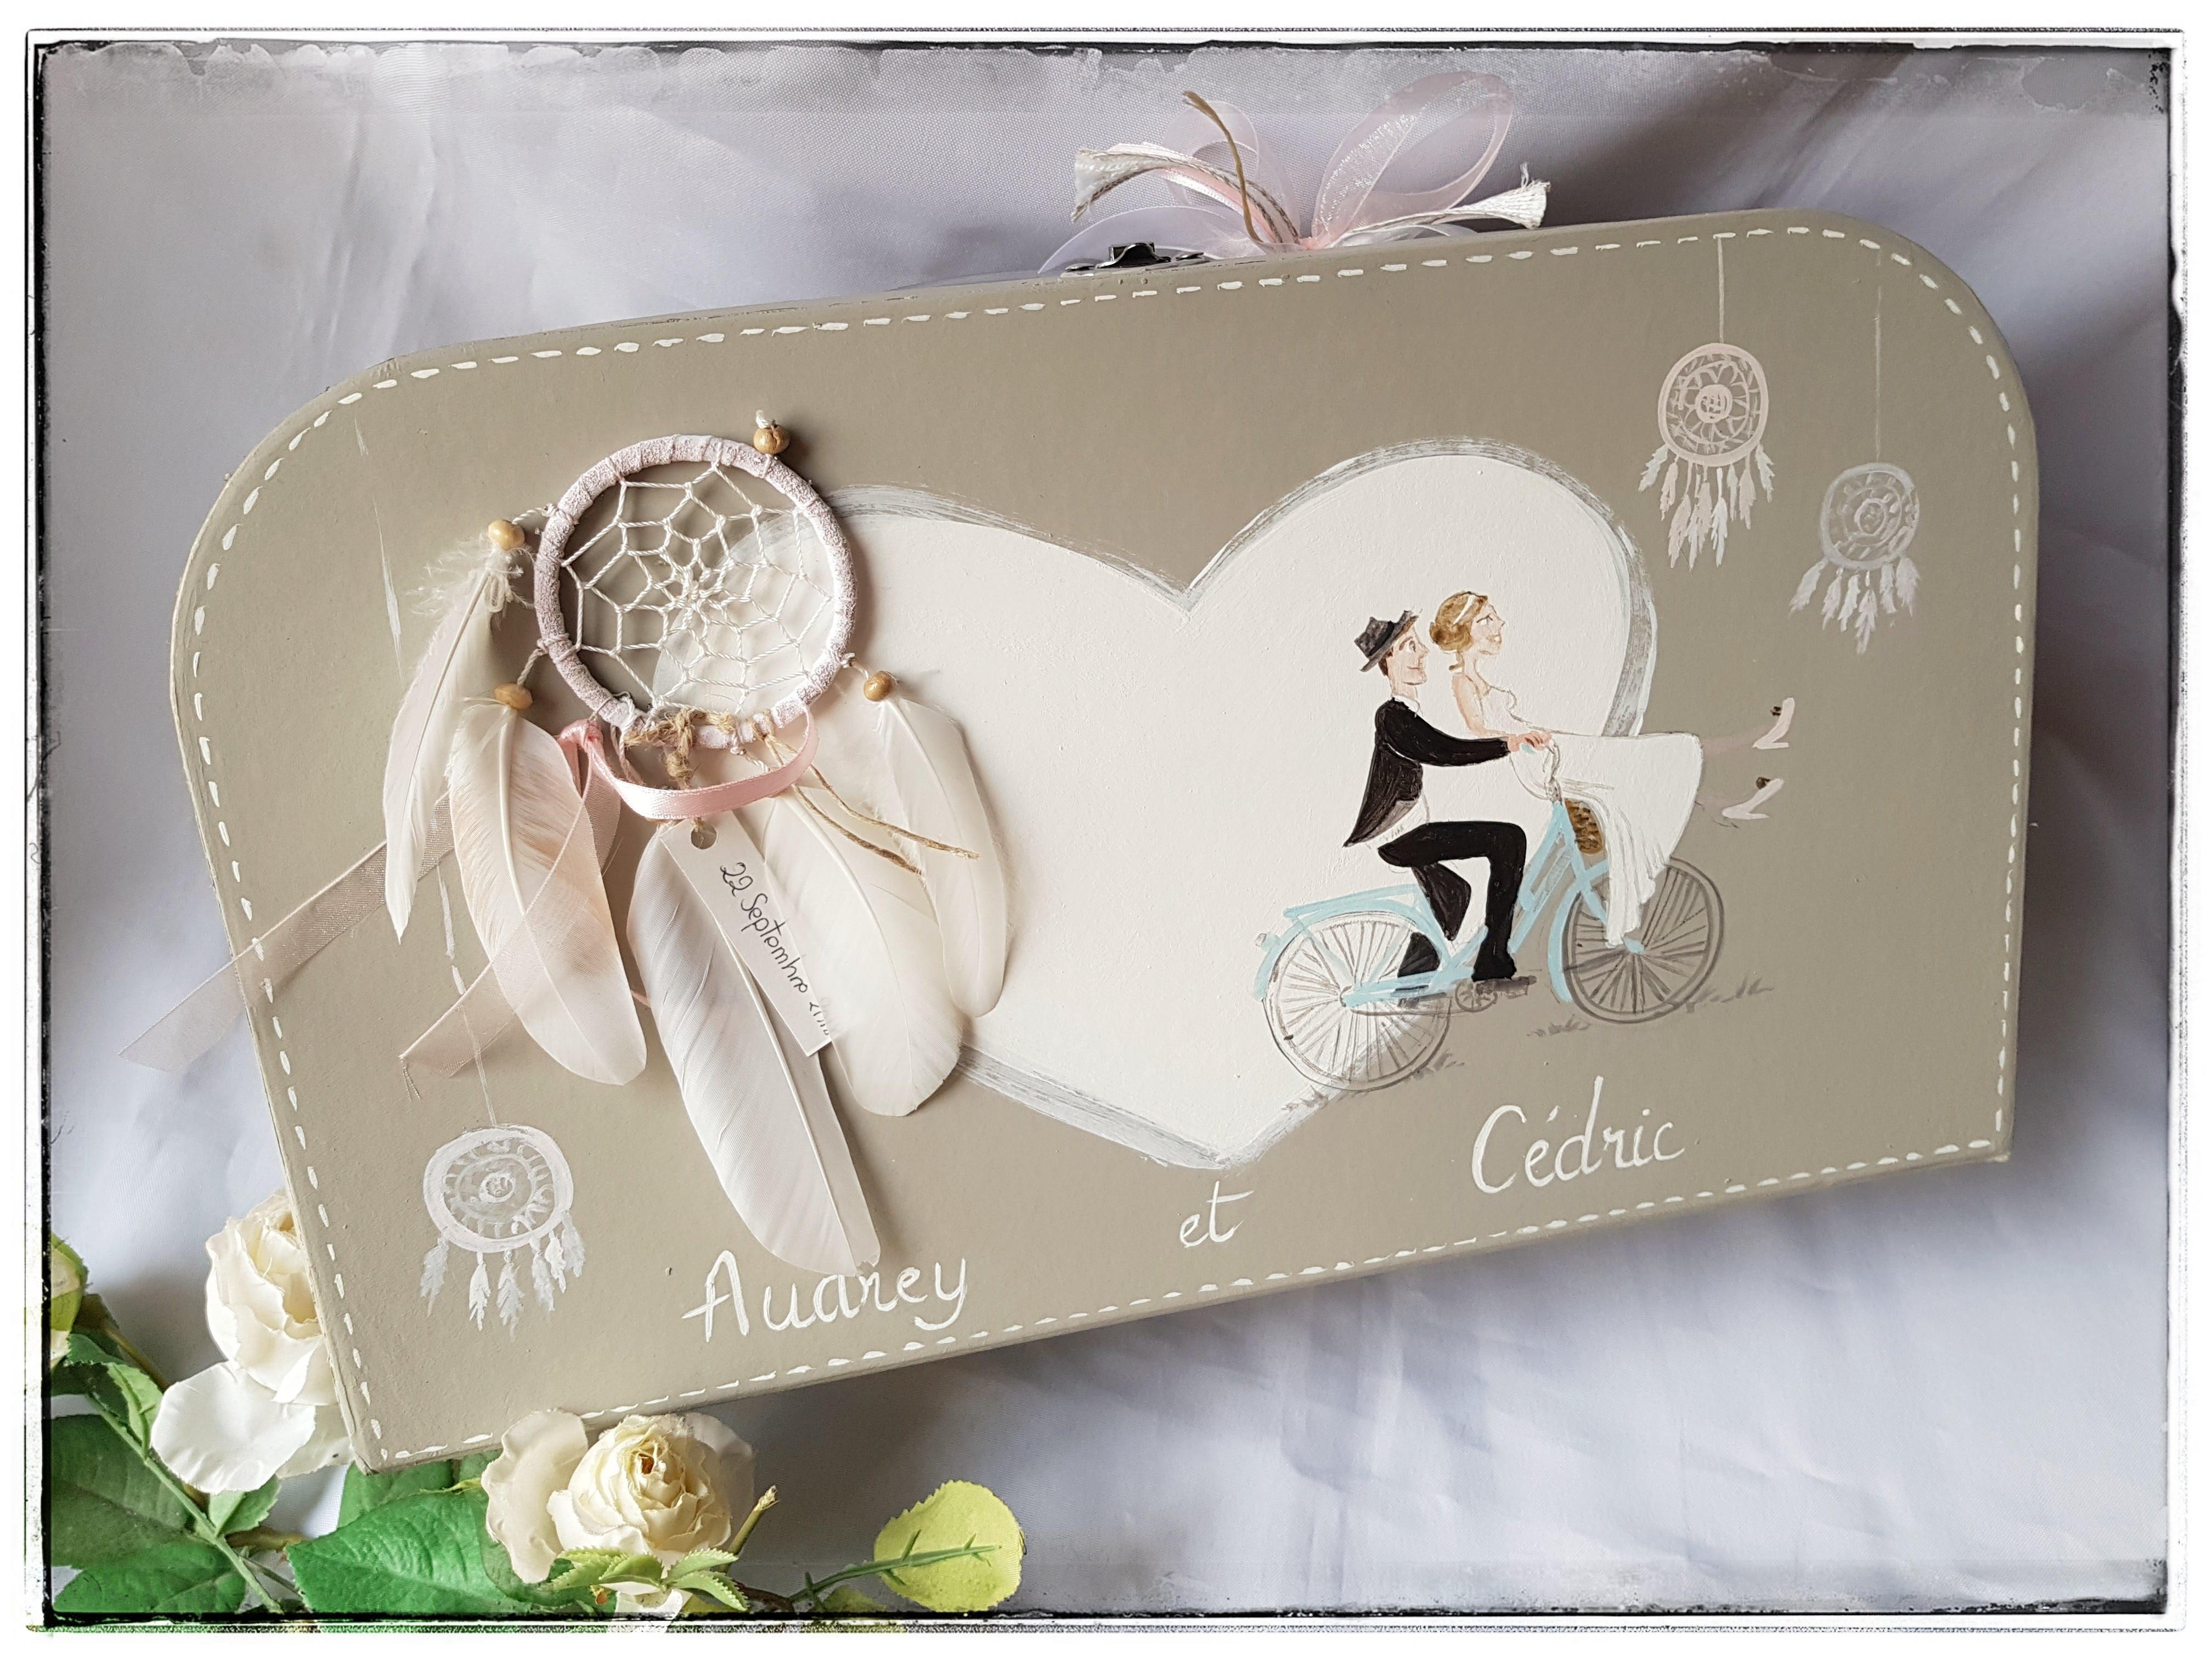 valise cagnotte mariage attrape r ve atelier plume d 39 ange. Black Bedroom Furniture Sets. Home Design Ideas